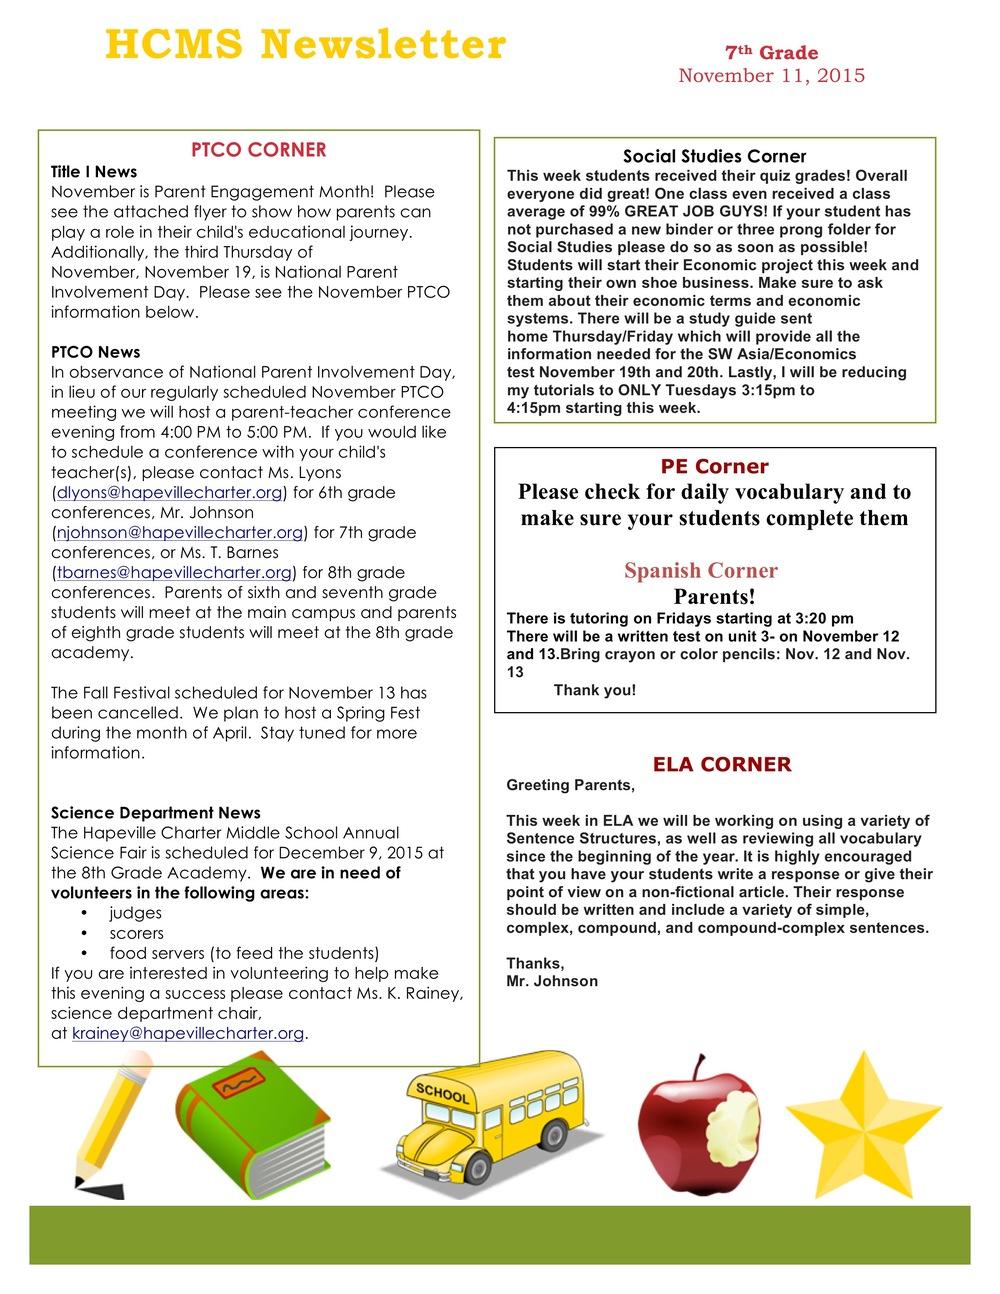 Newsletter Image7th grade Nov 9.jpeg